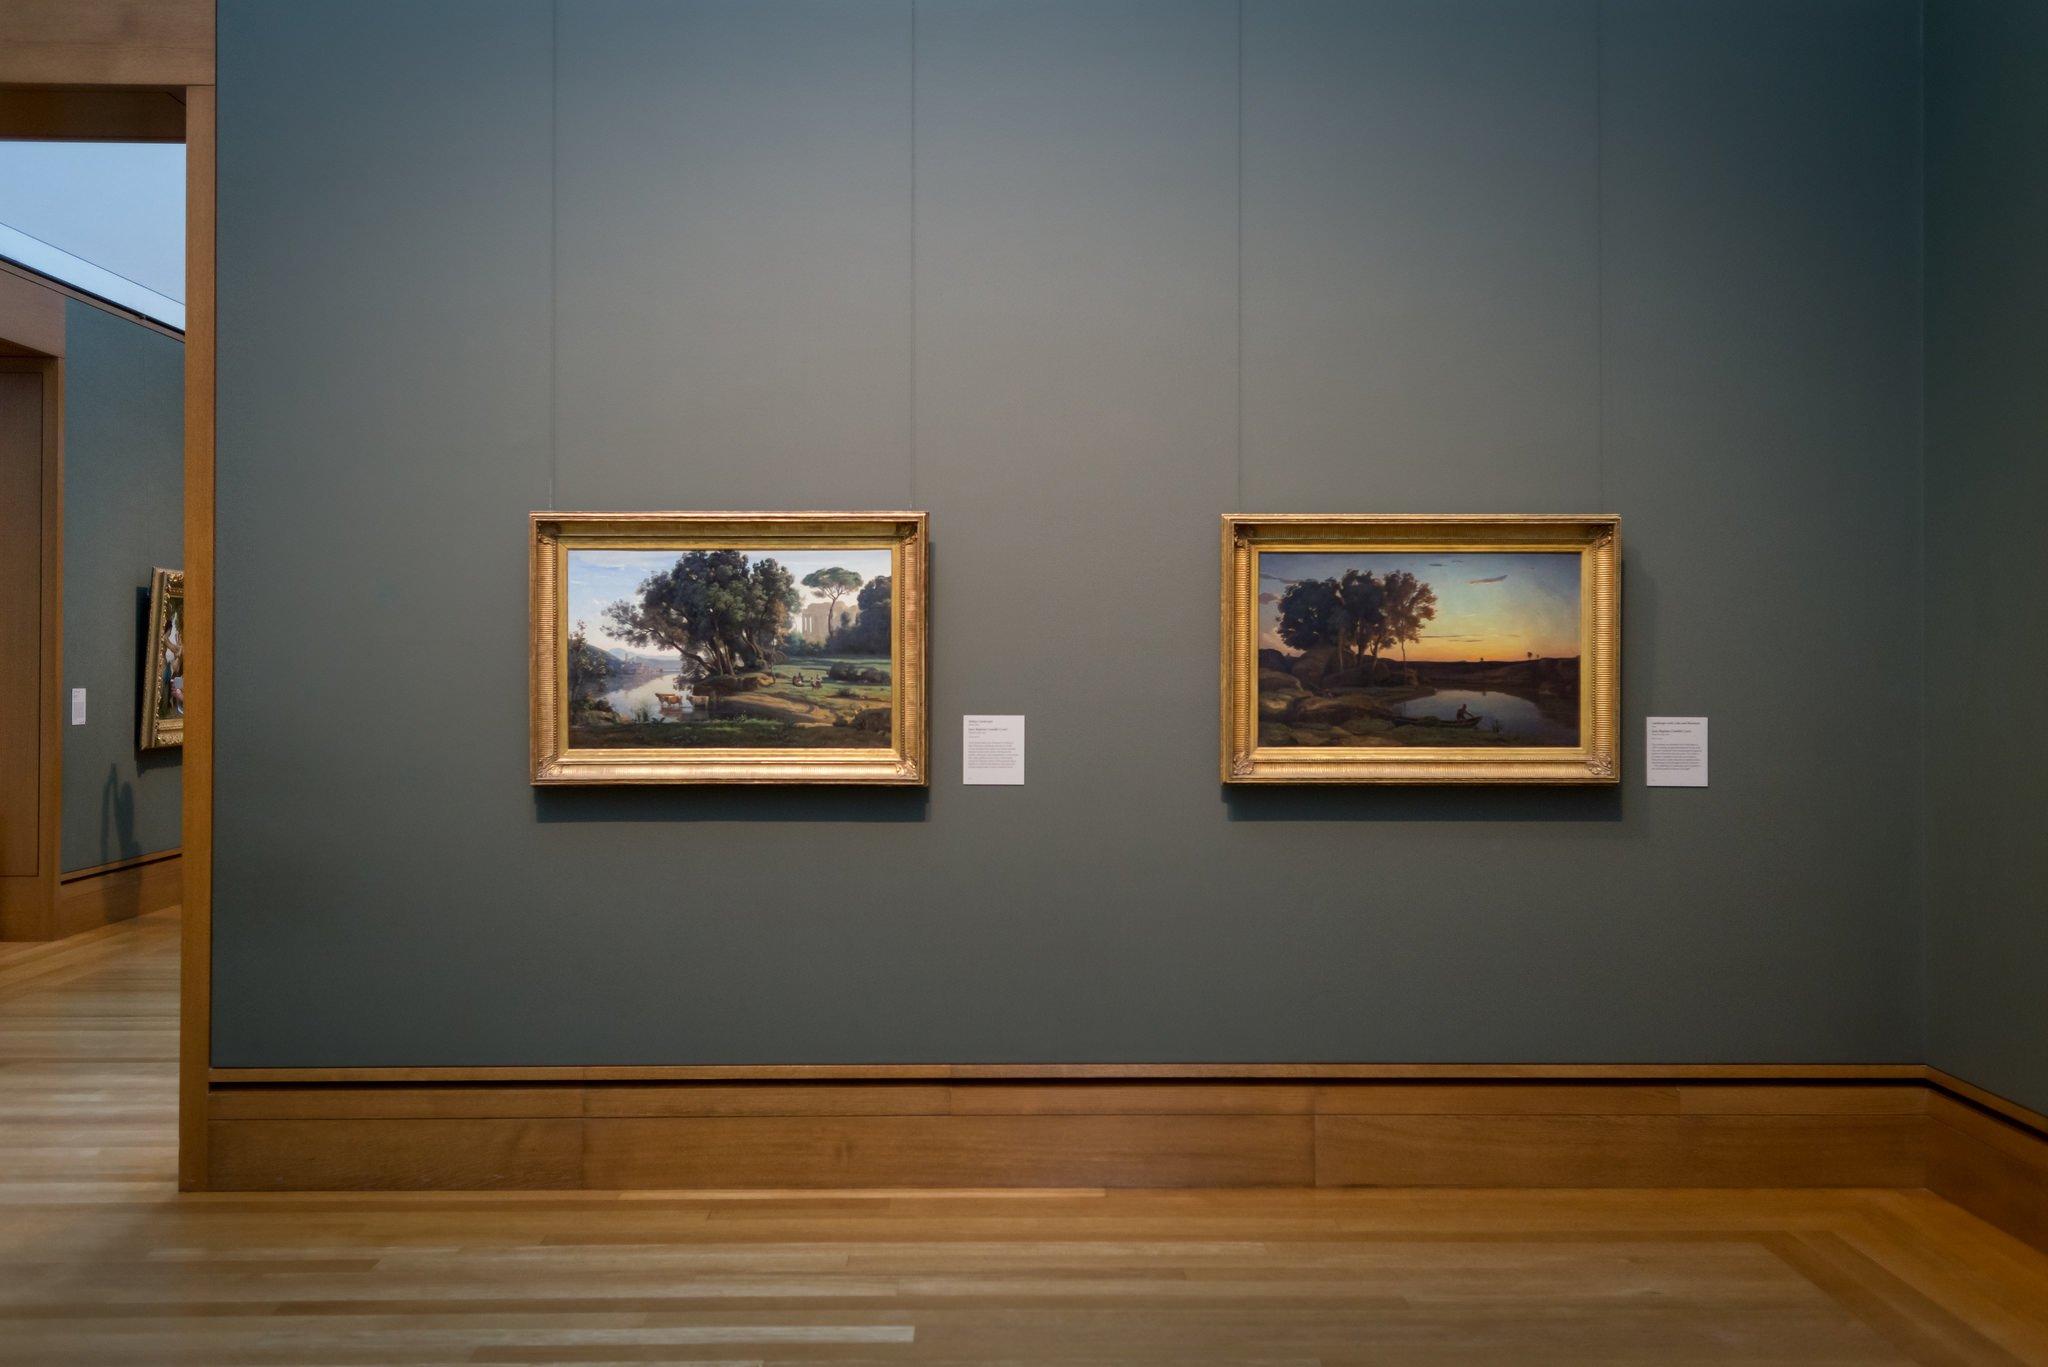 для восстановления сайт для фото галереи касается ошибки